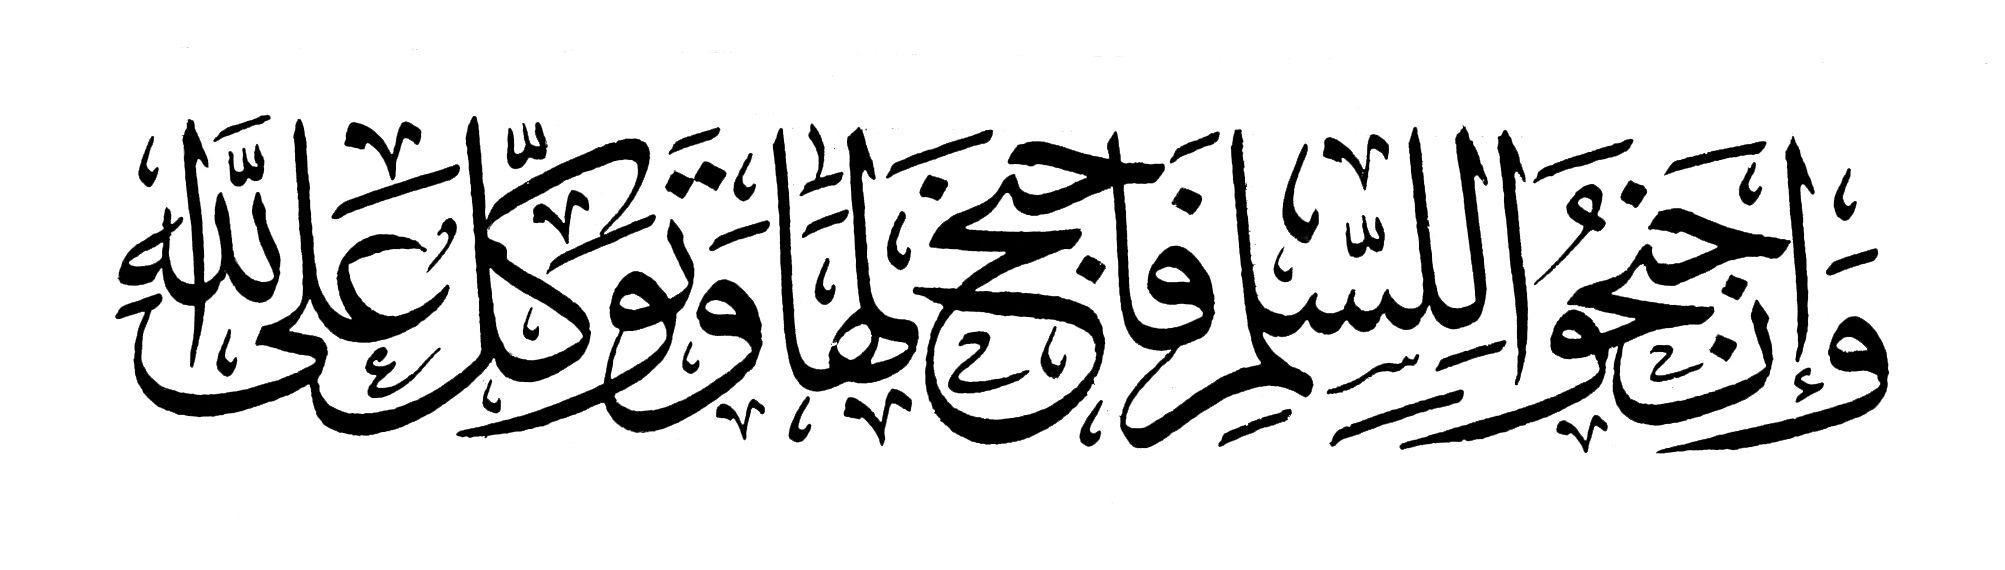 Pin By بسم الله الرحمن الرحيم On 2 مخطوطات اسلامية Calligraphy Arabic Calligraphy